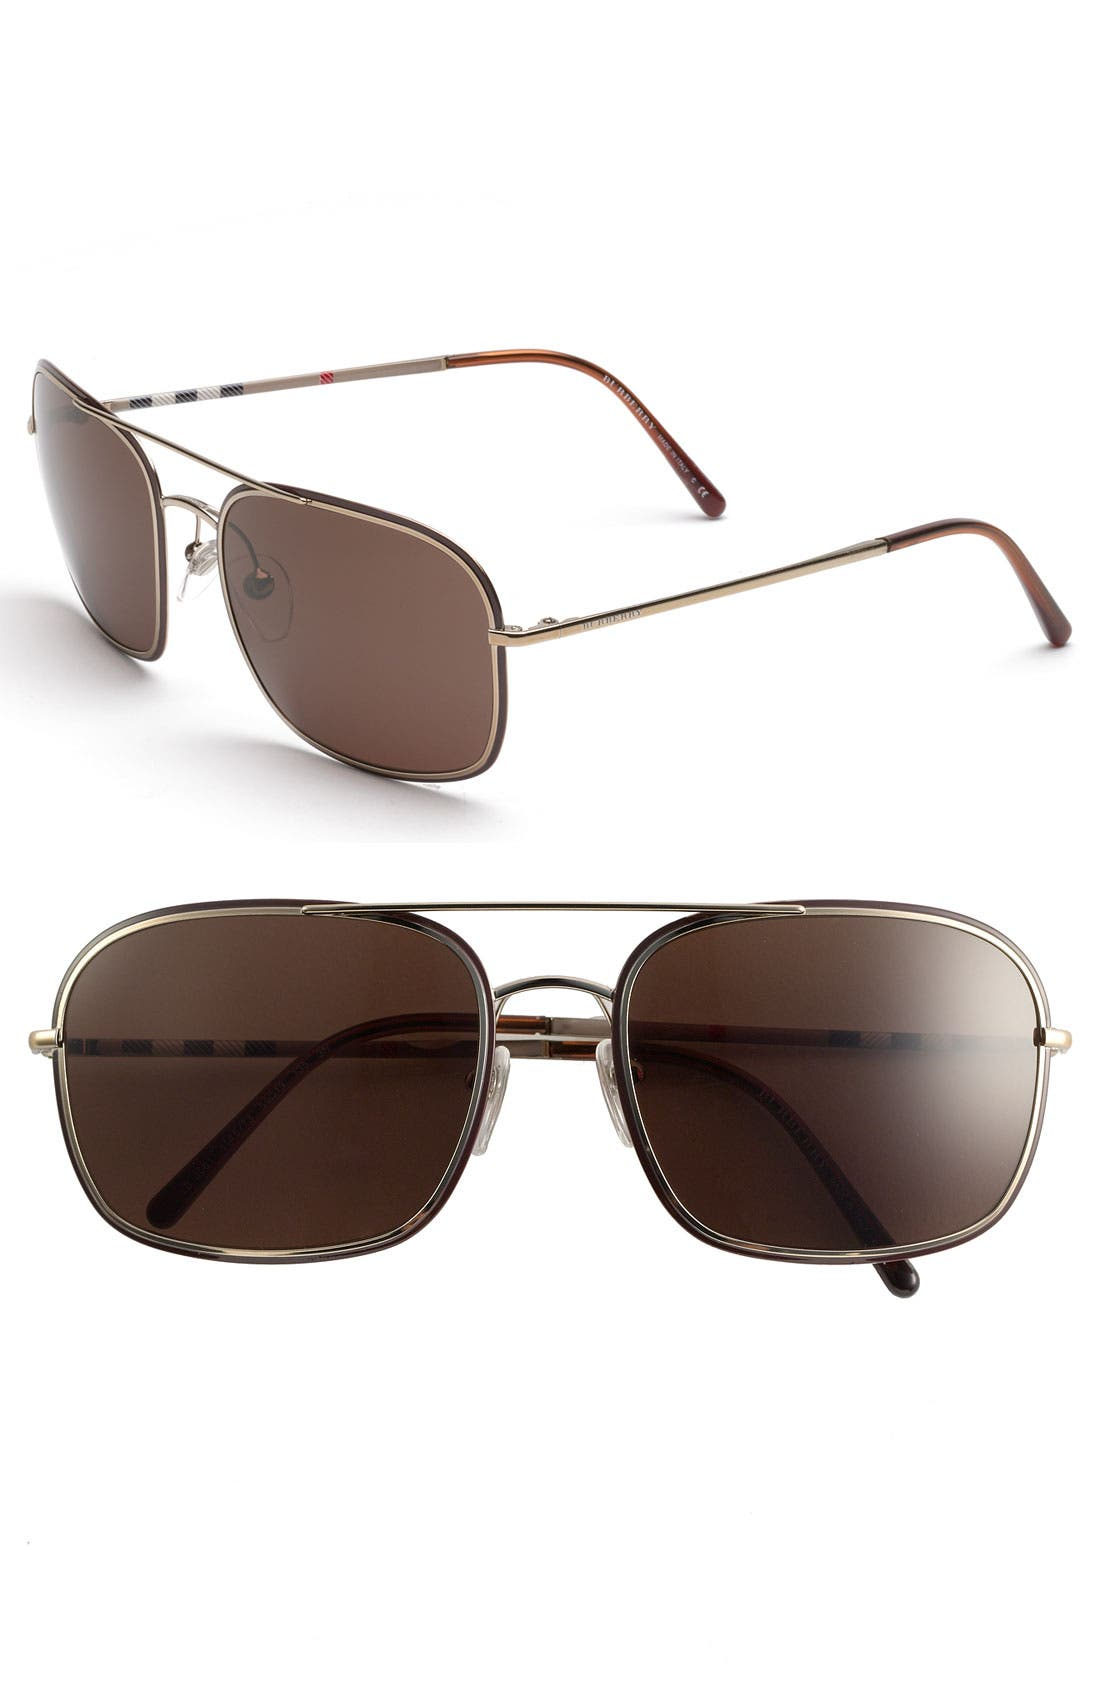 Main Image - Burberry Navigator Sunglasses